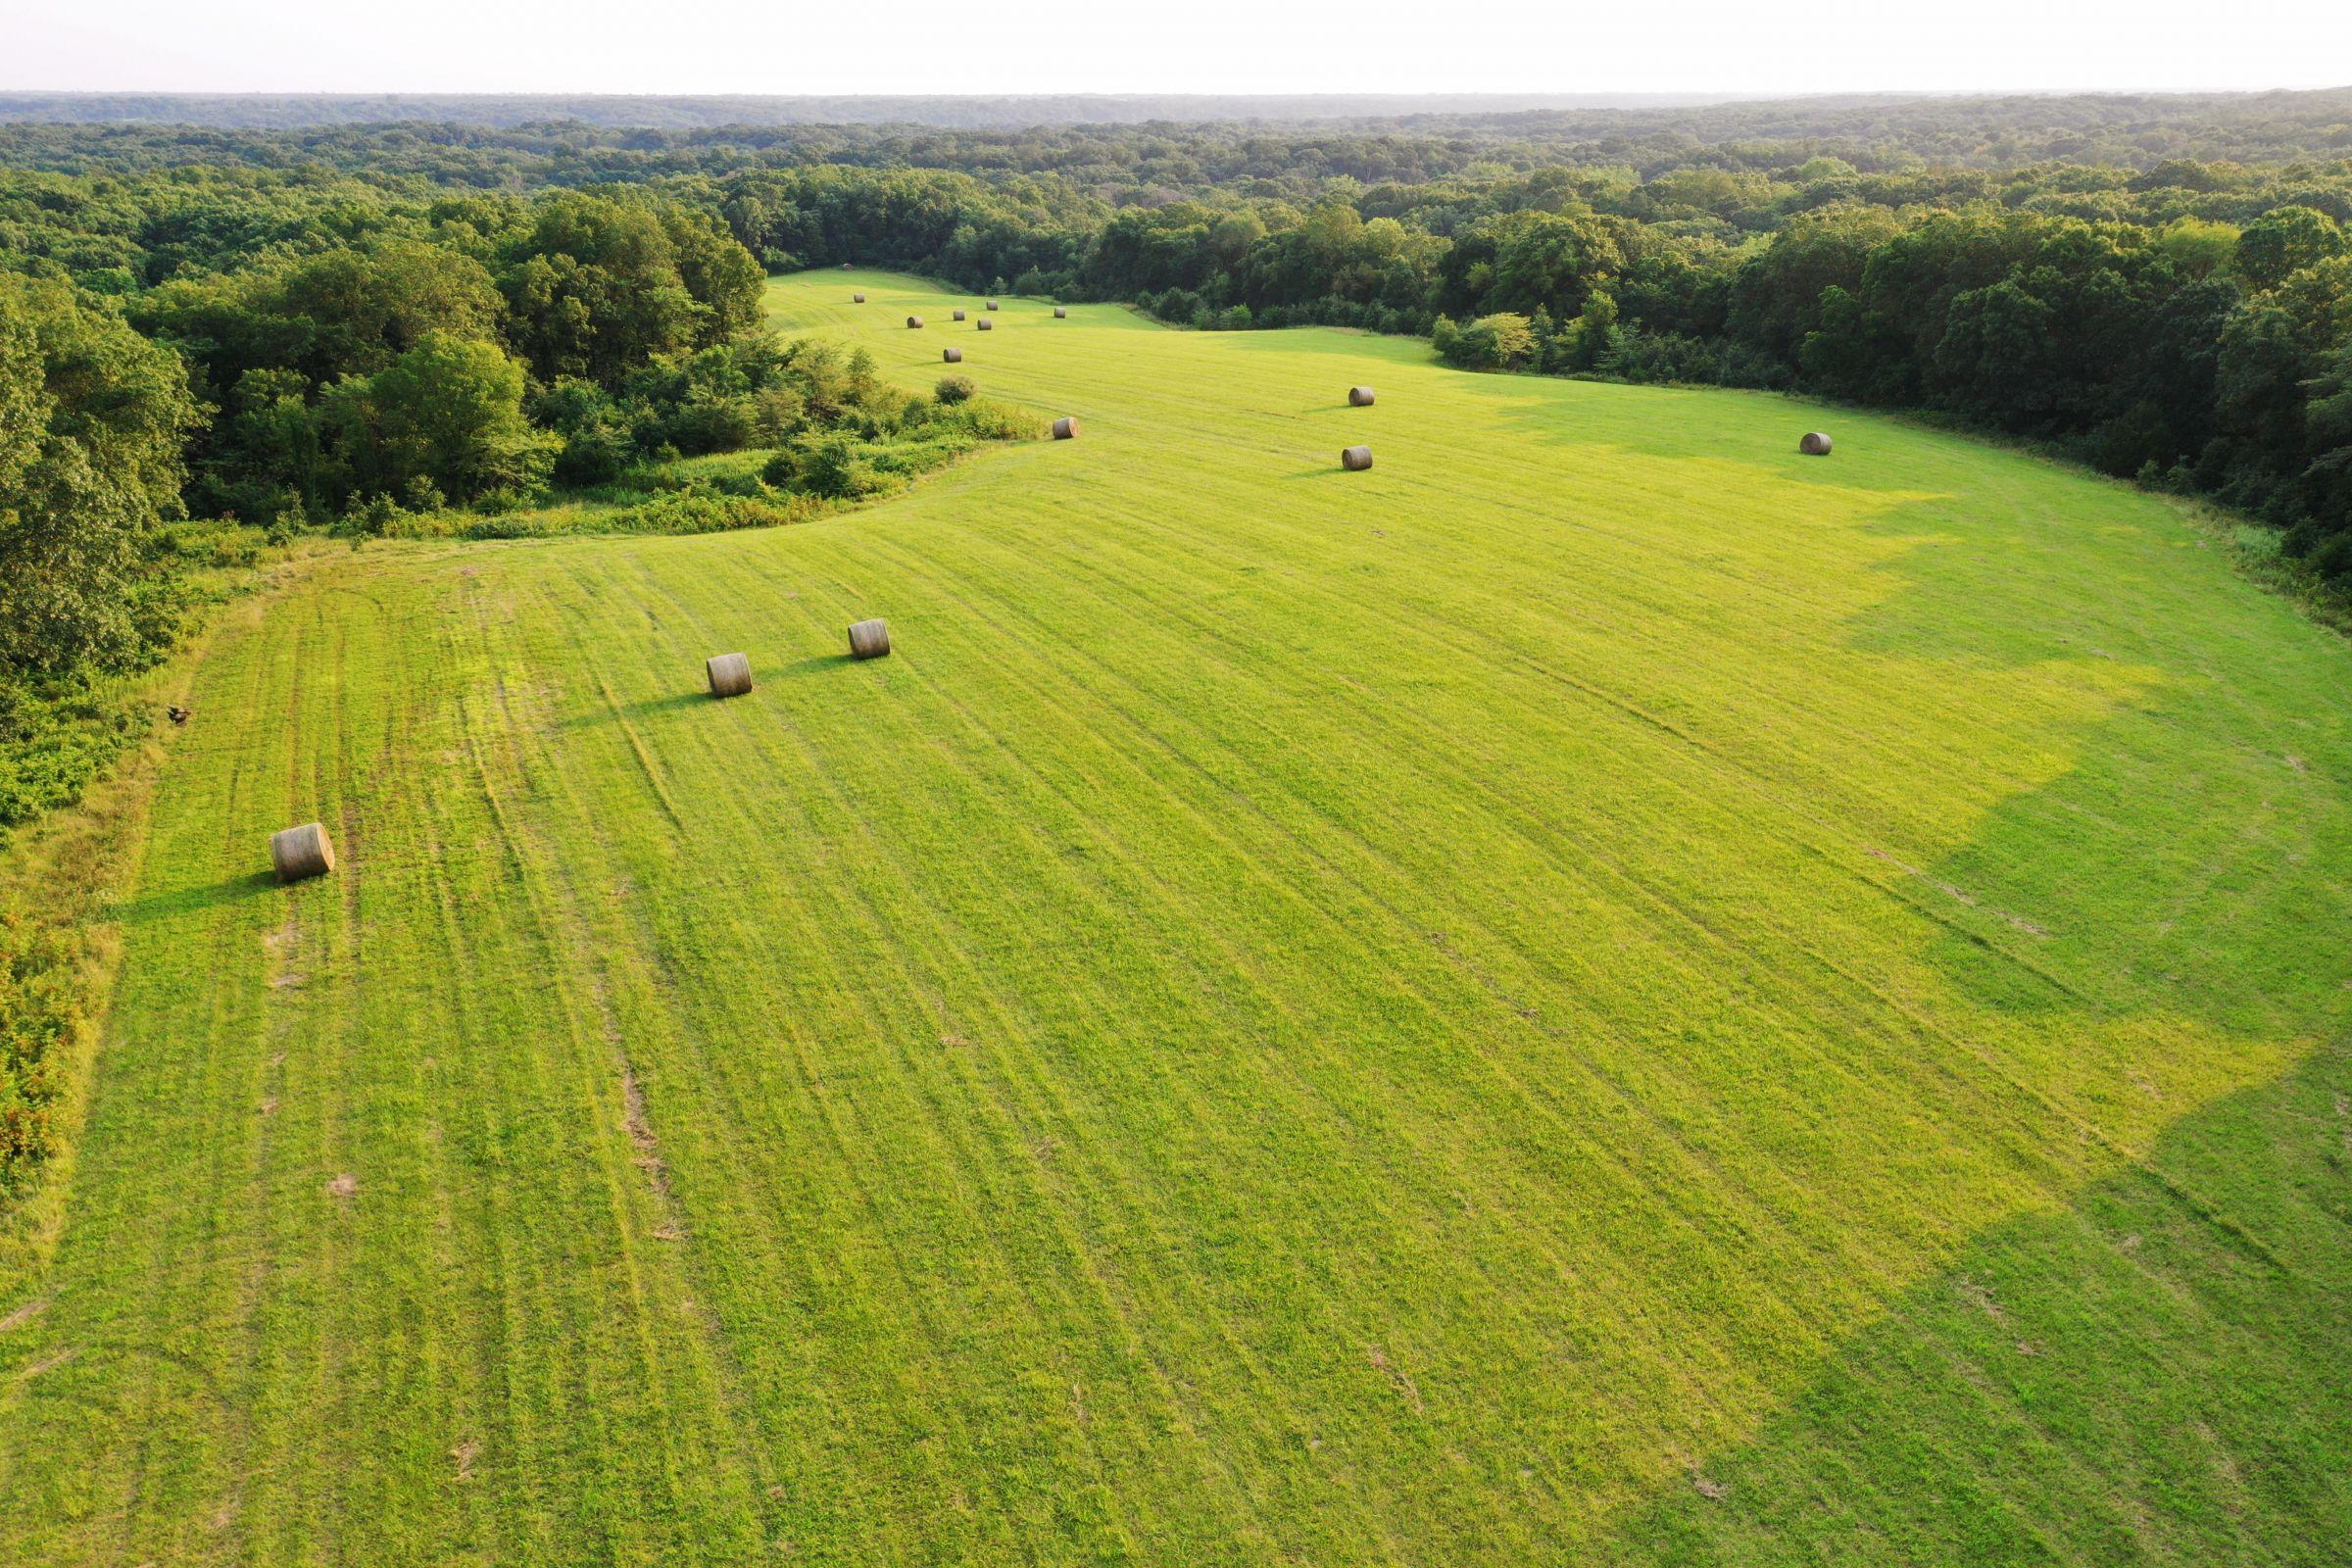 land-lee-county-iowa-340-acres-listing-number-15649-1-2021-07-21-185535.jpg